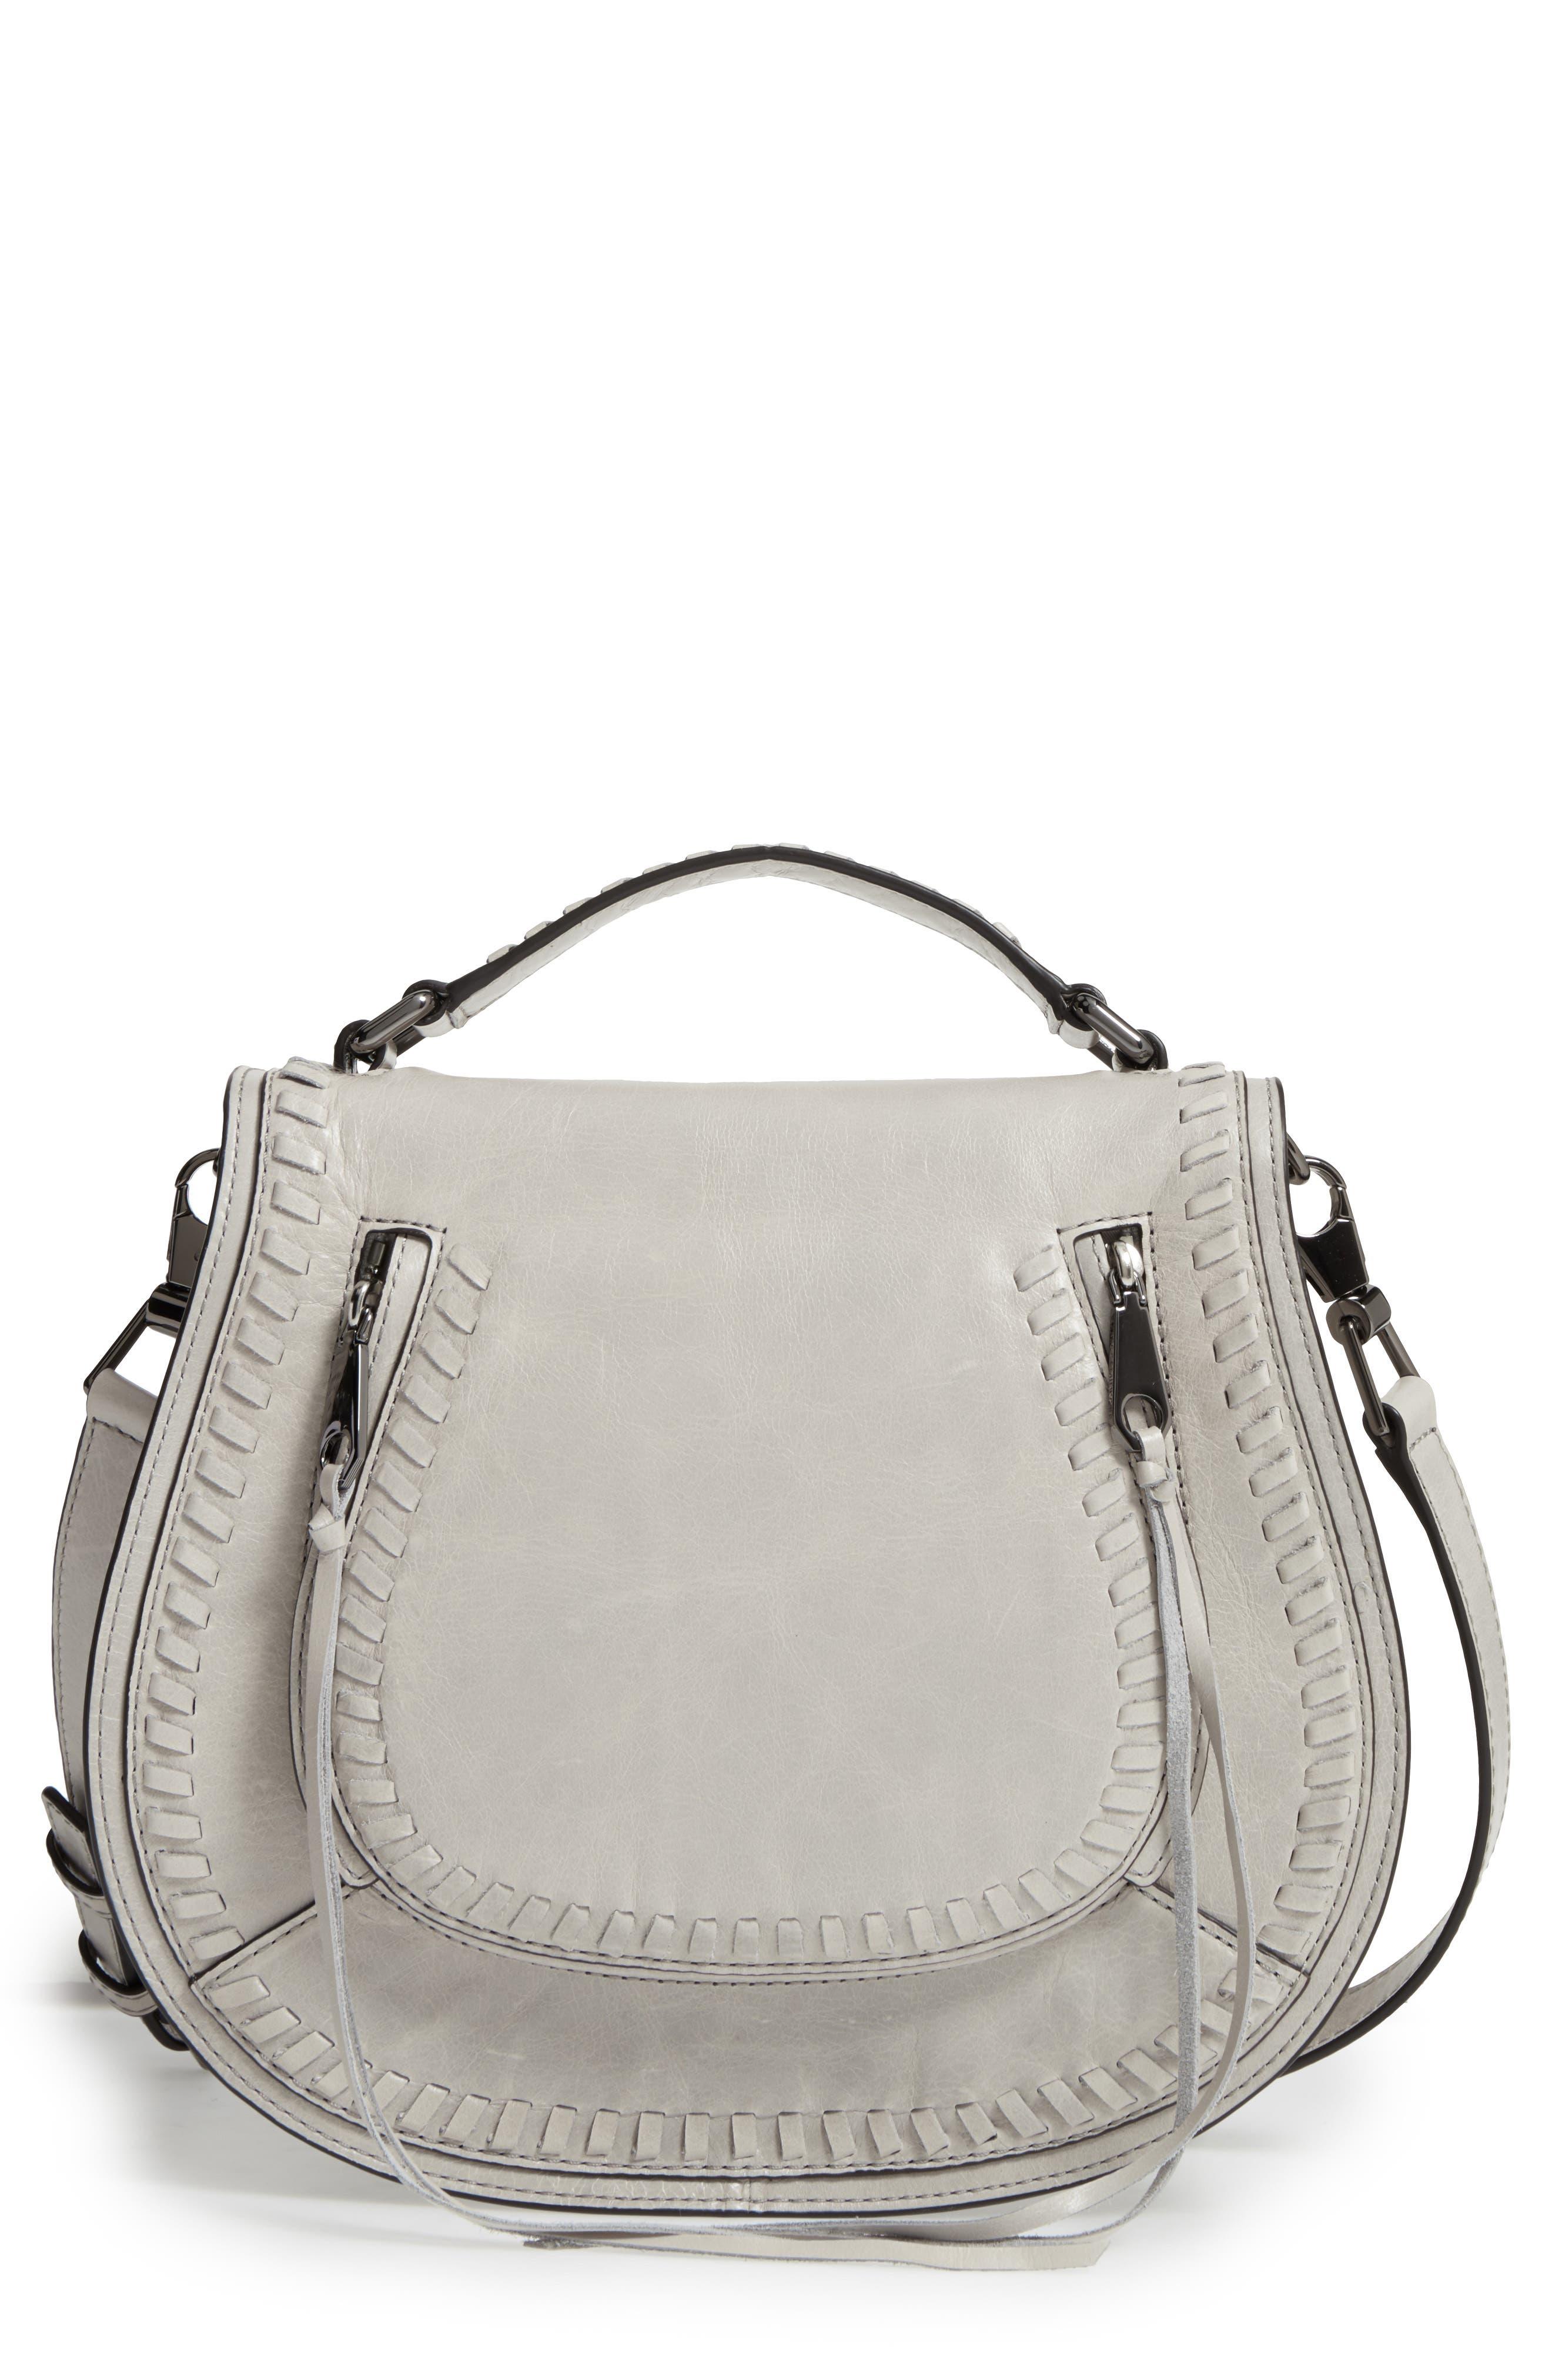 Main Image - Rebecca Minkoff Vanity Saddle Bag